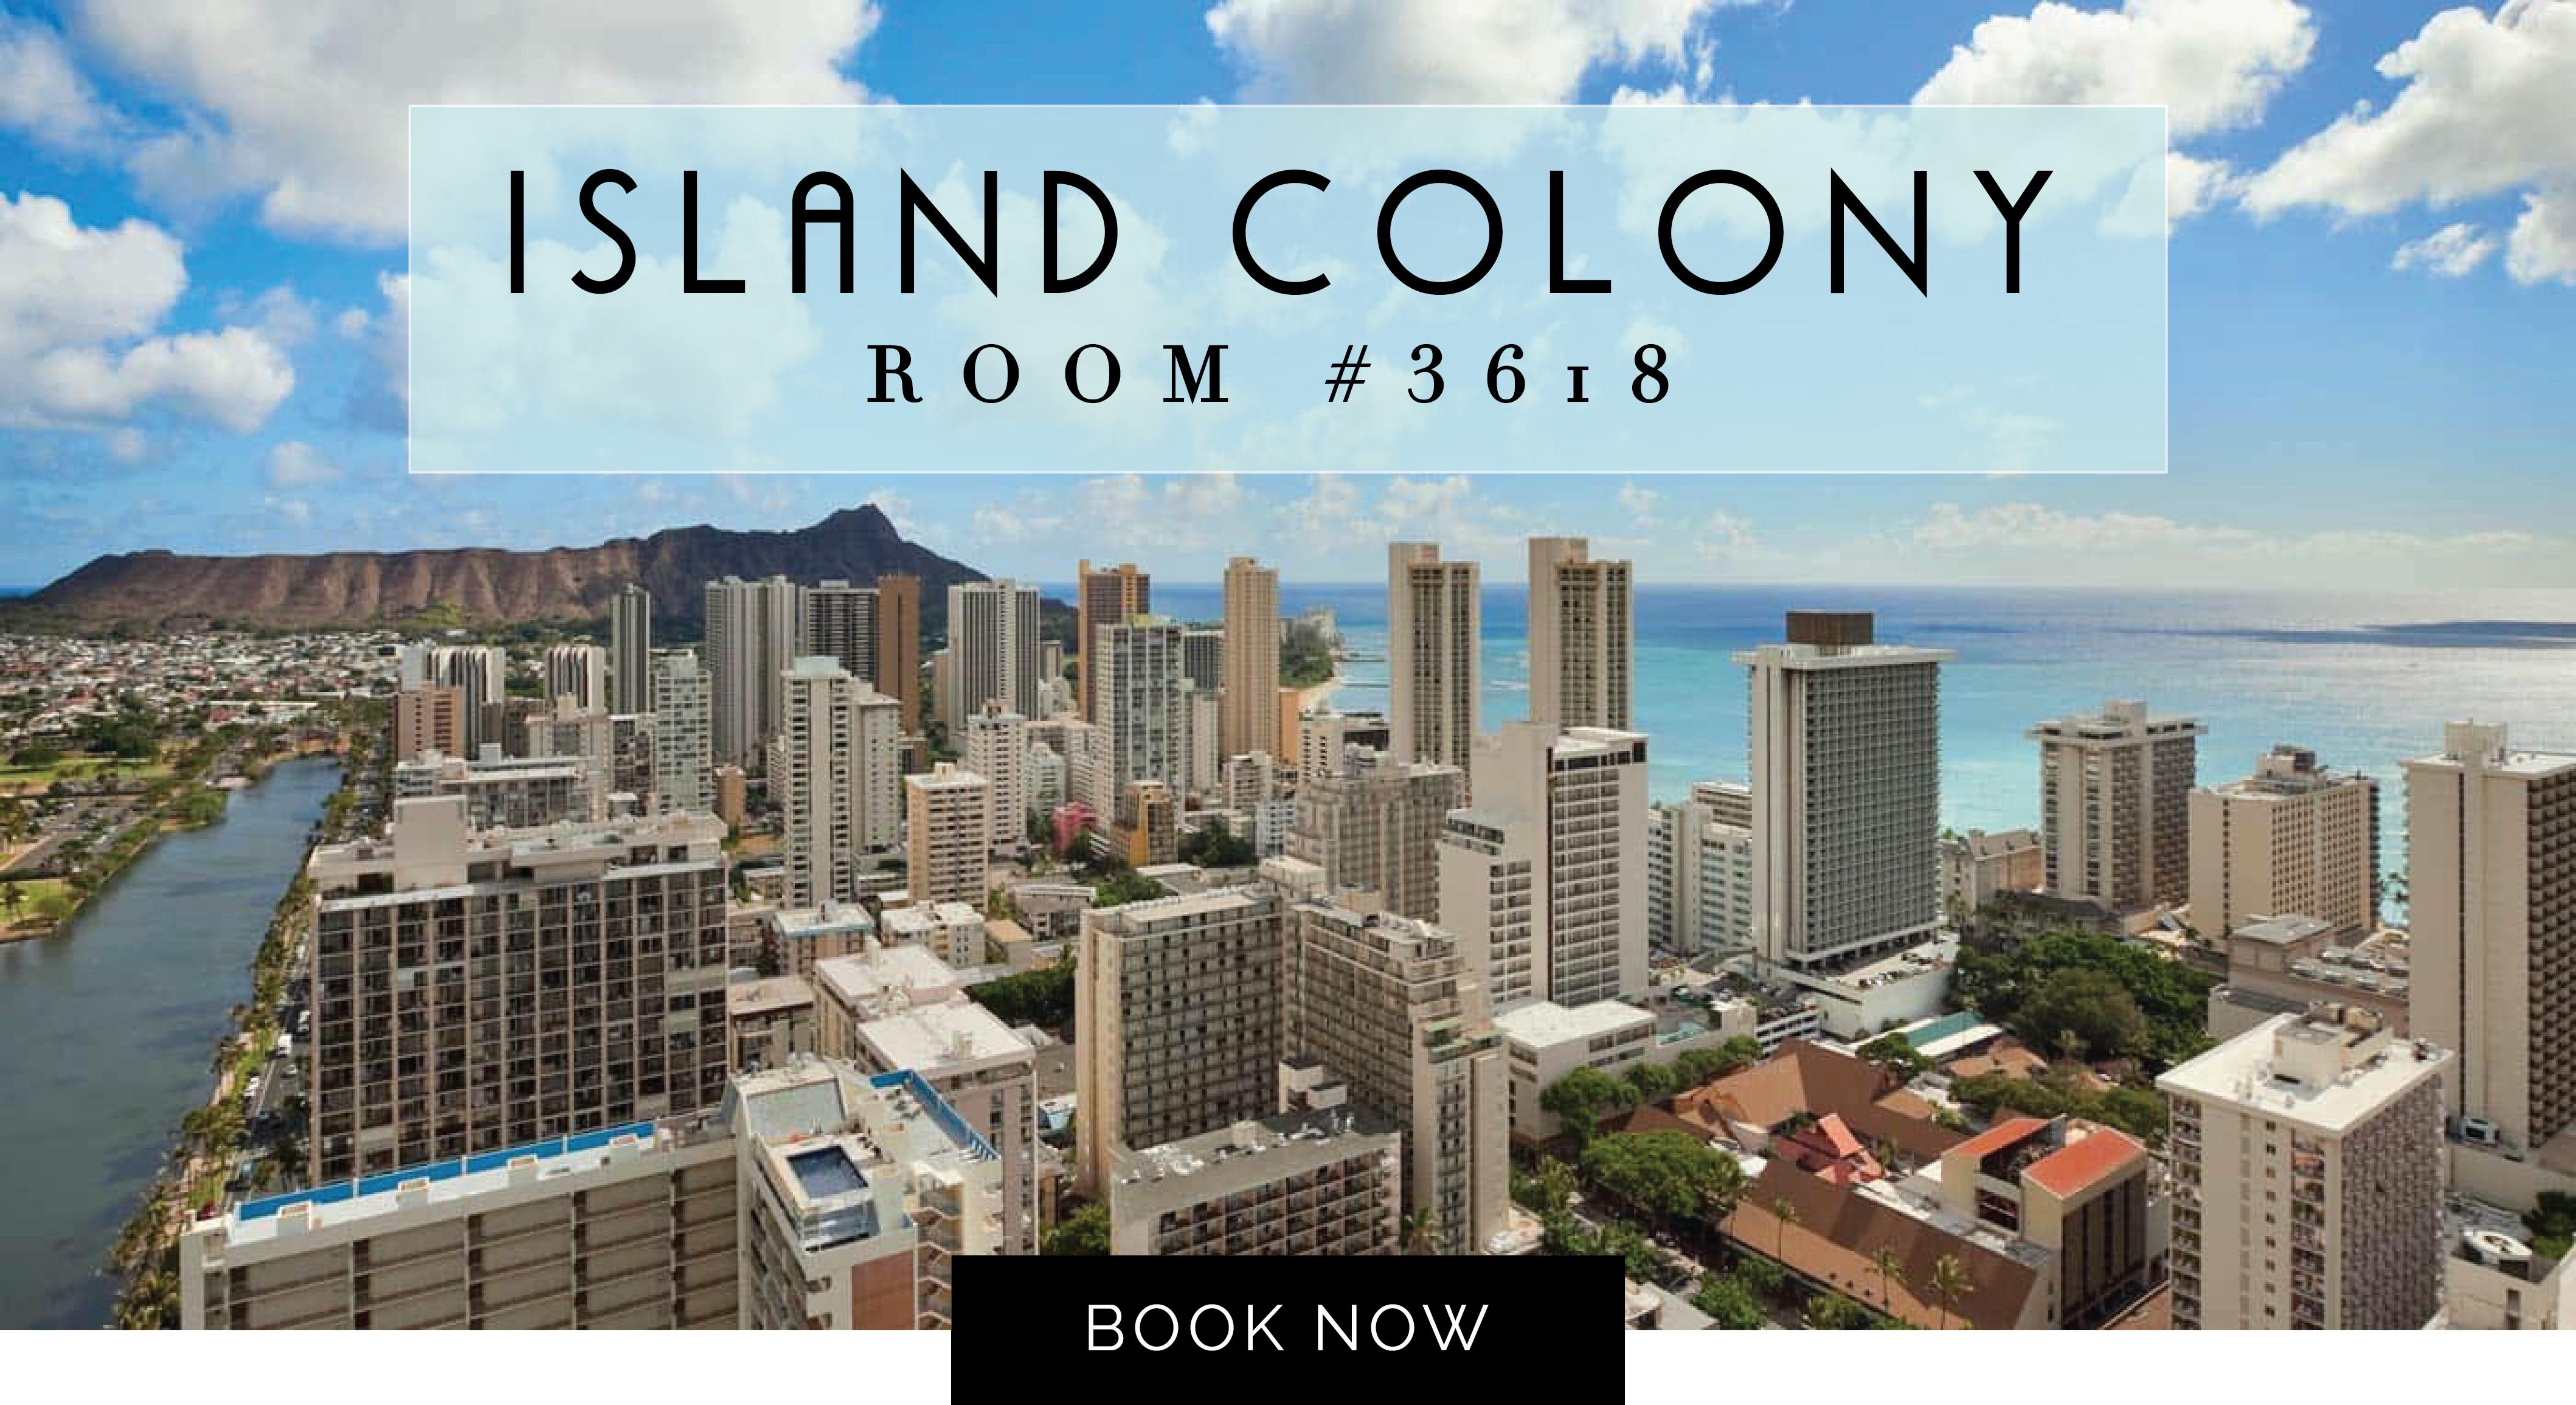 ISLAND COLONY ROOM #3618